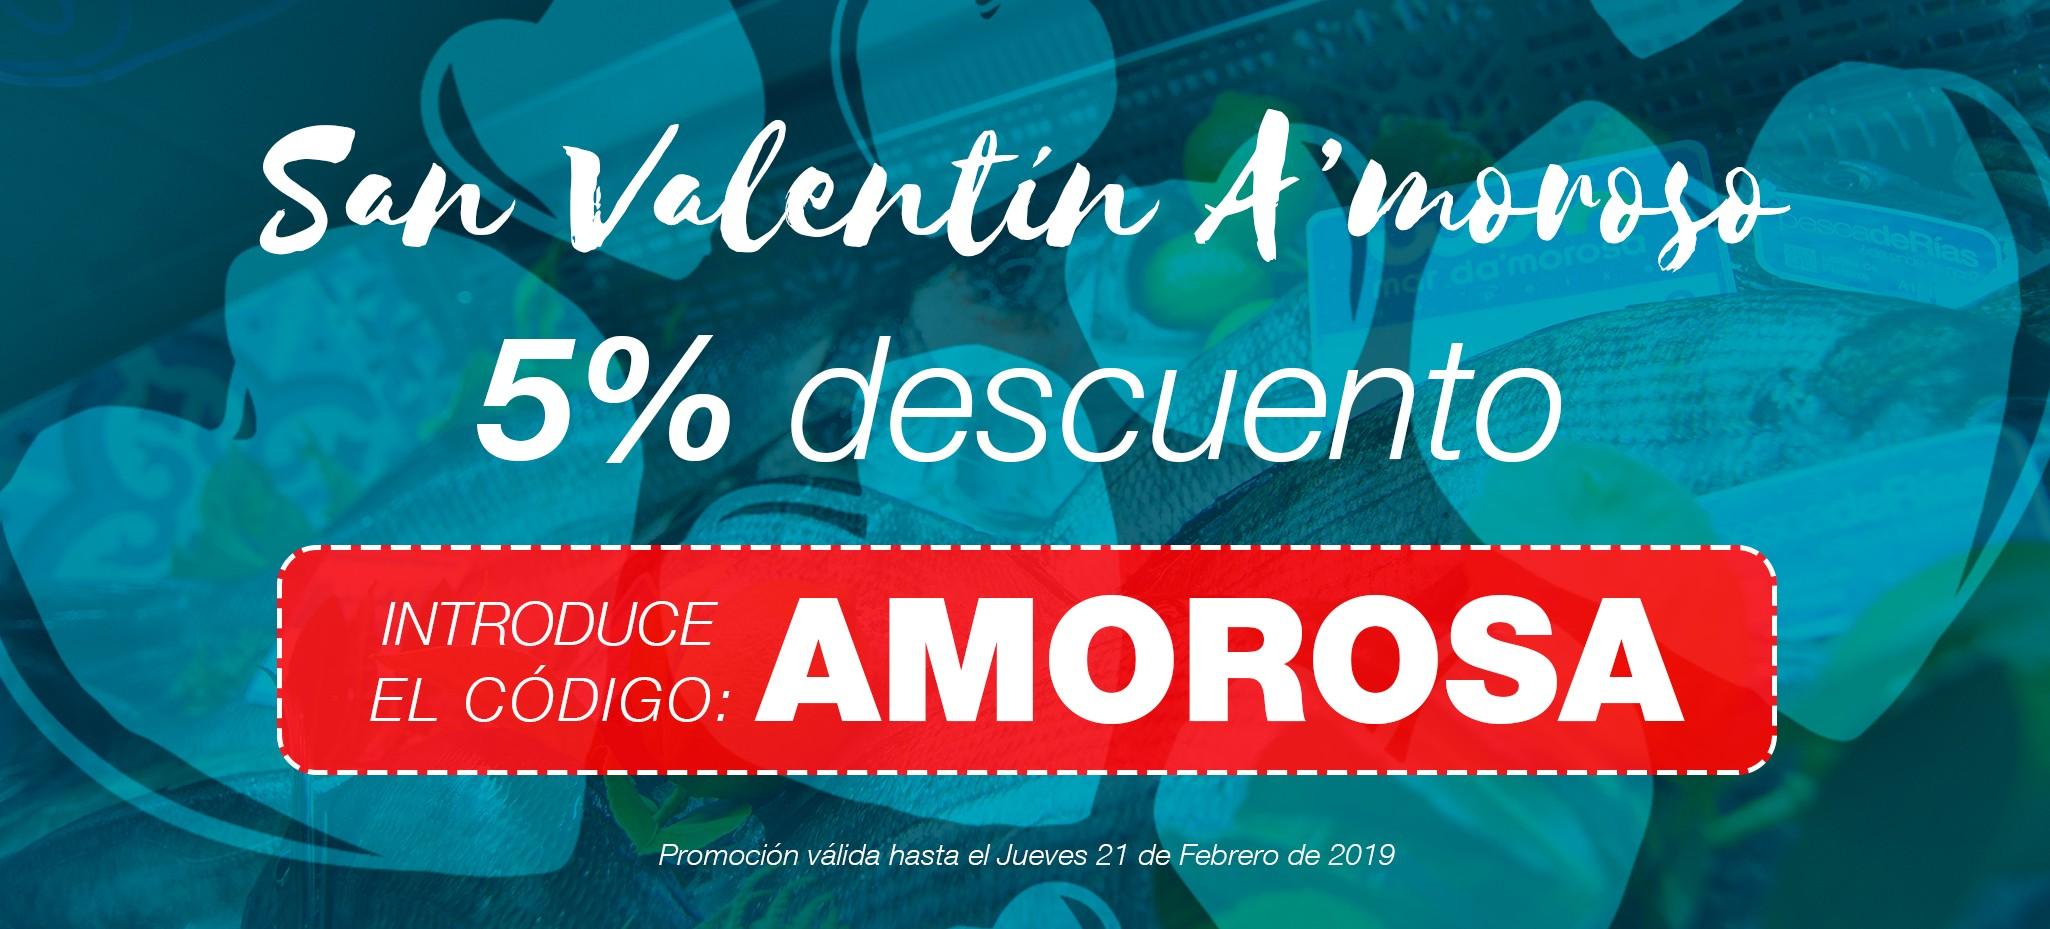 San Valentín A'Moroso